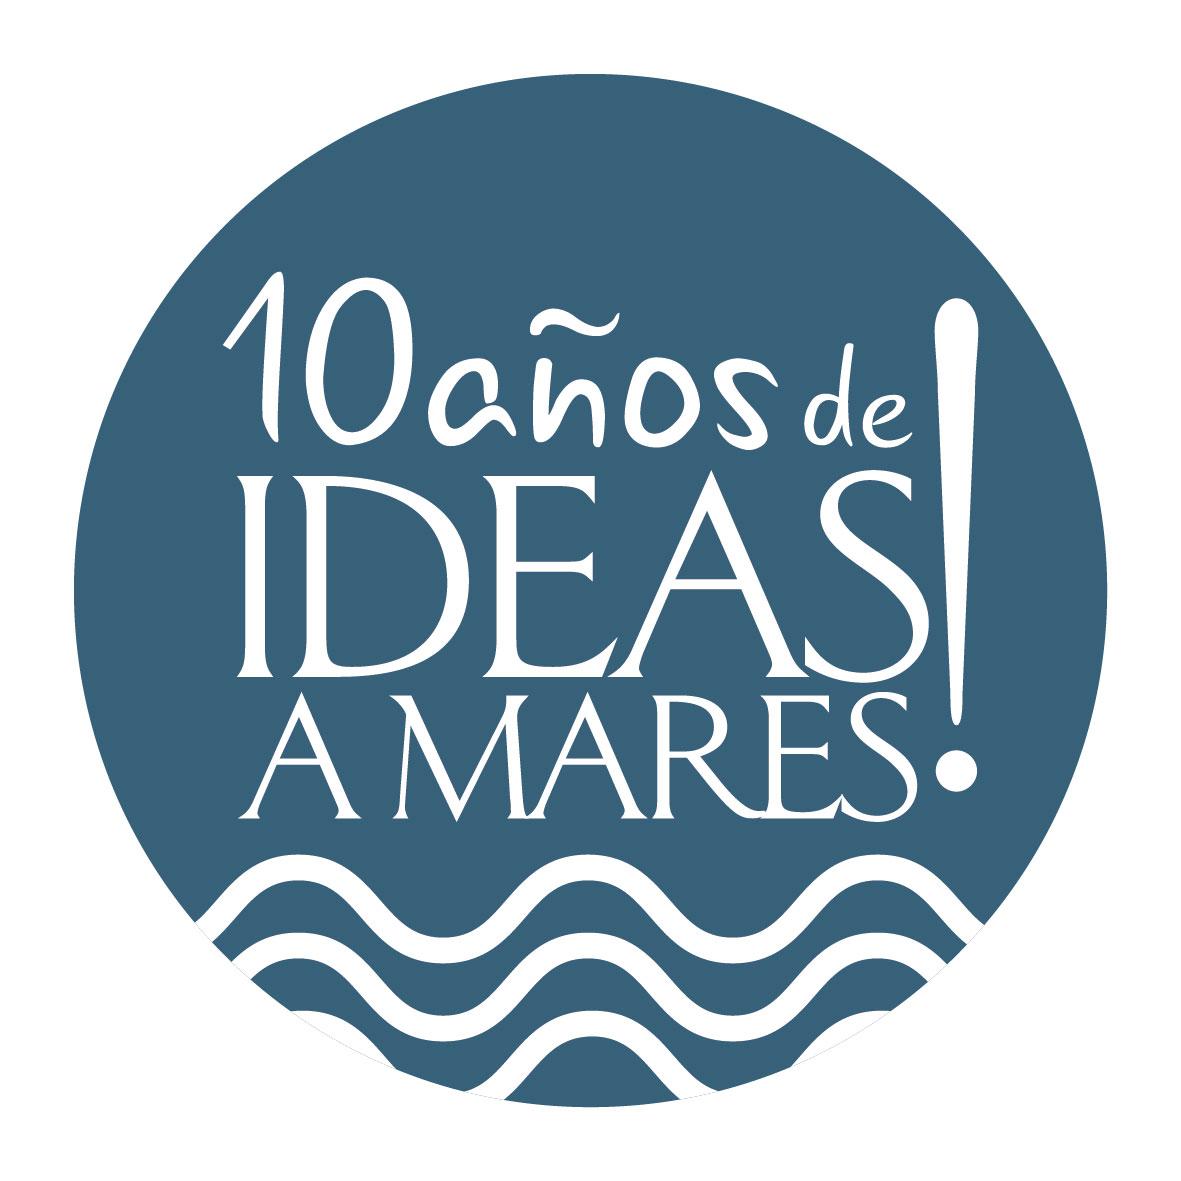 Edita: IdeasAmares!